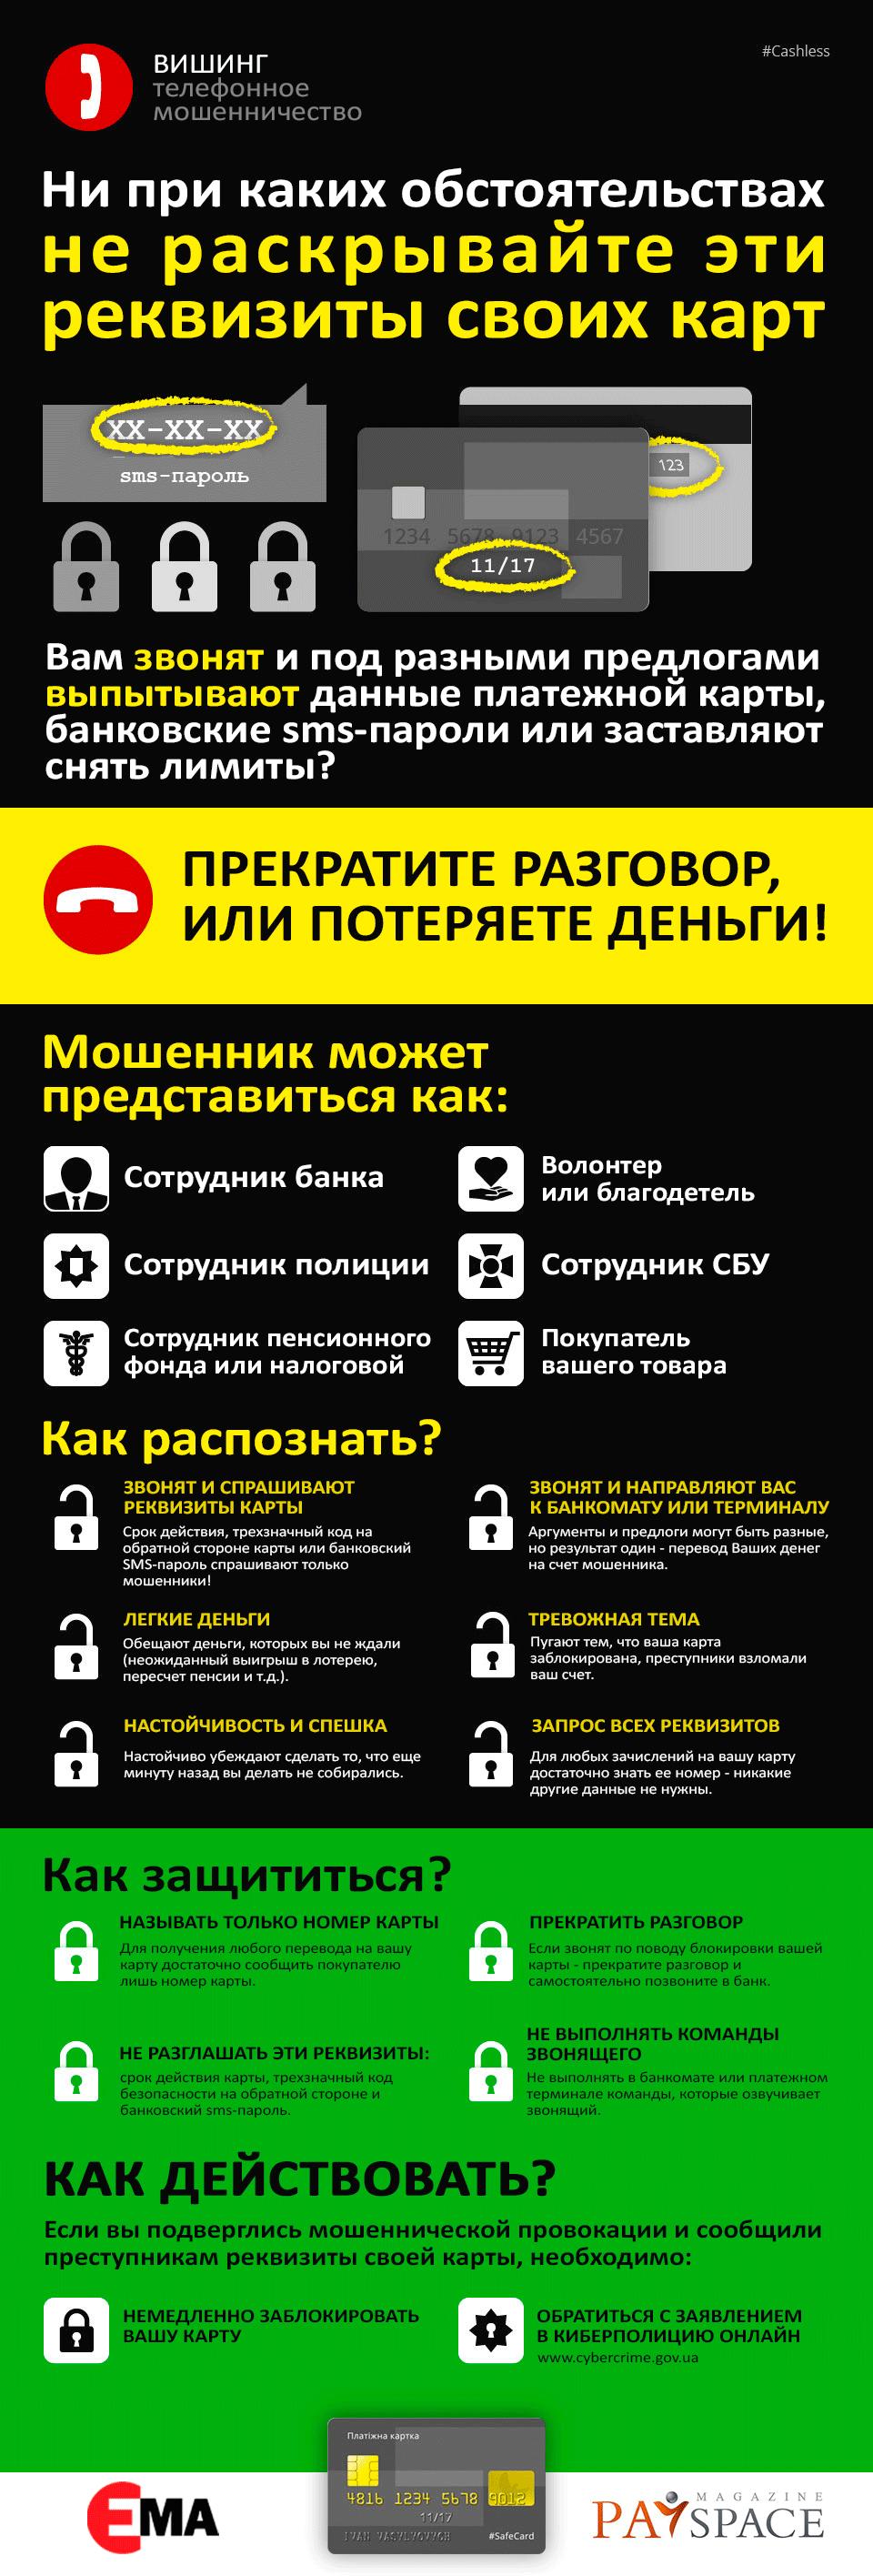 infographic_ema-psm